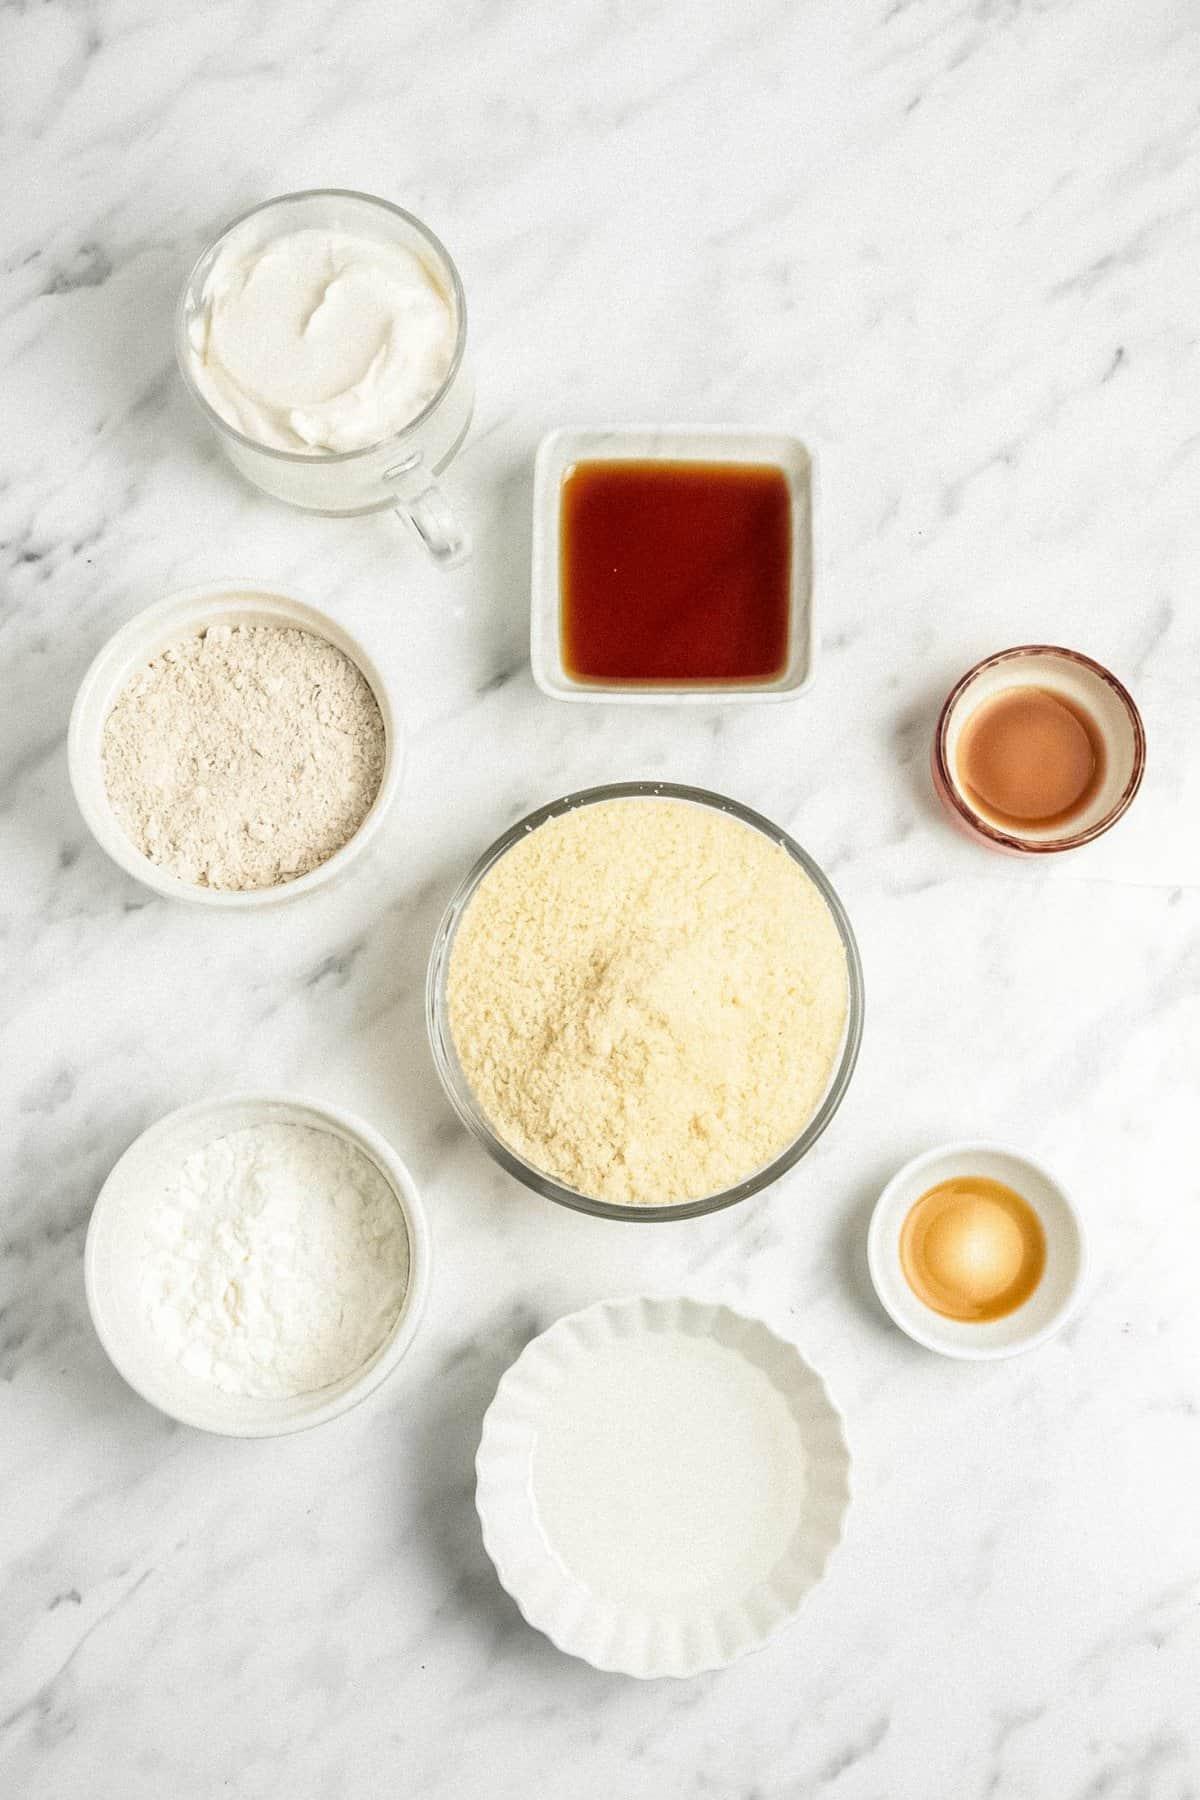 Vegan Gluten-Free Sugar Cut Out Cookie Ingredients